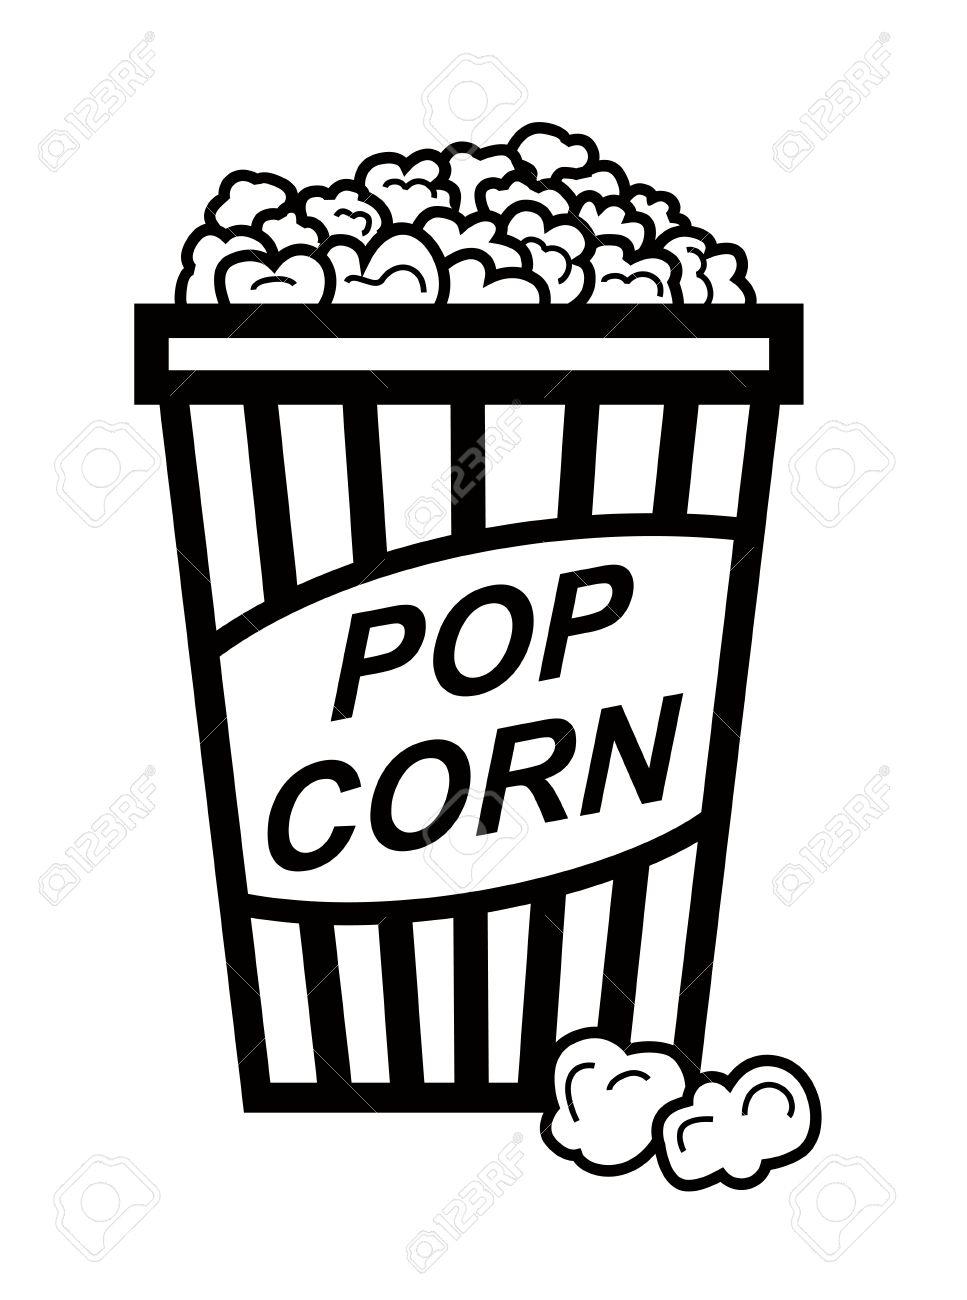 Popcorn clipart black and white Luxury Vector Black Pop Corn.